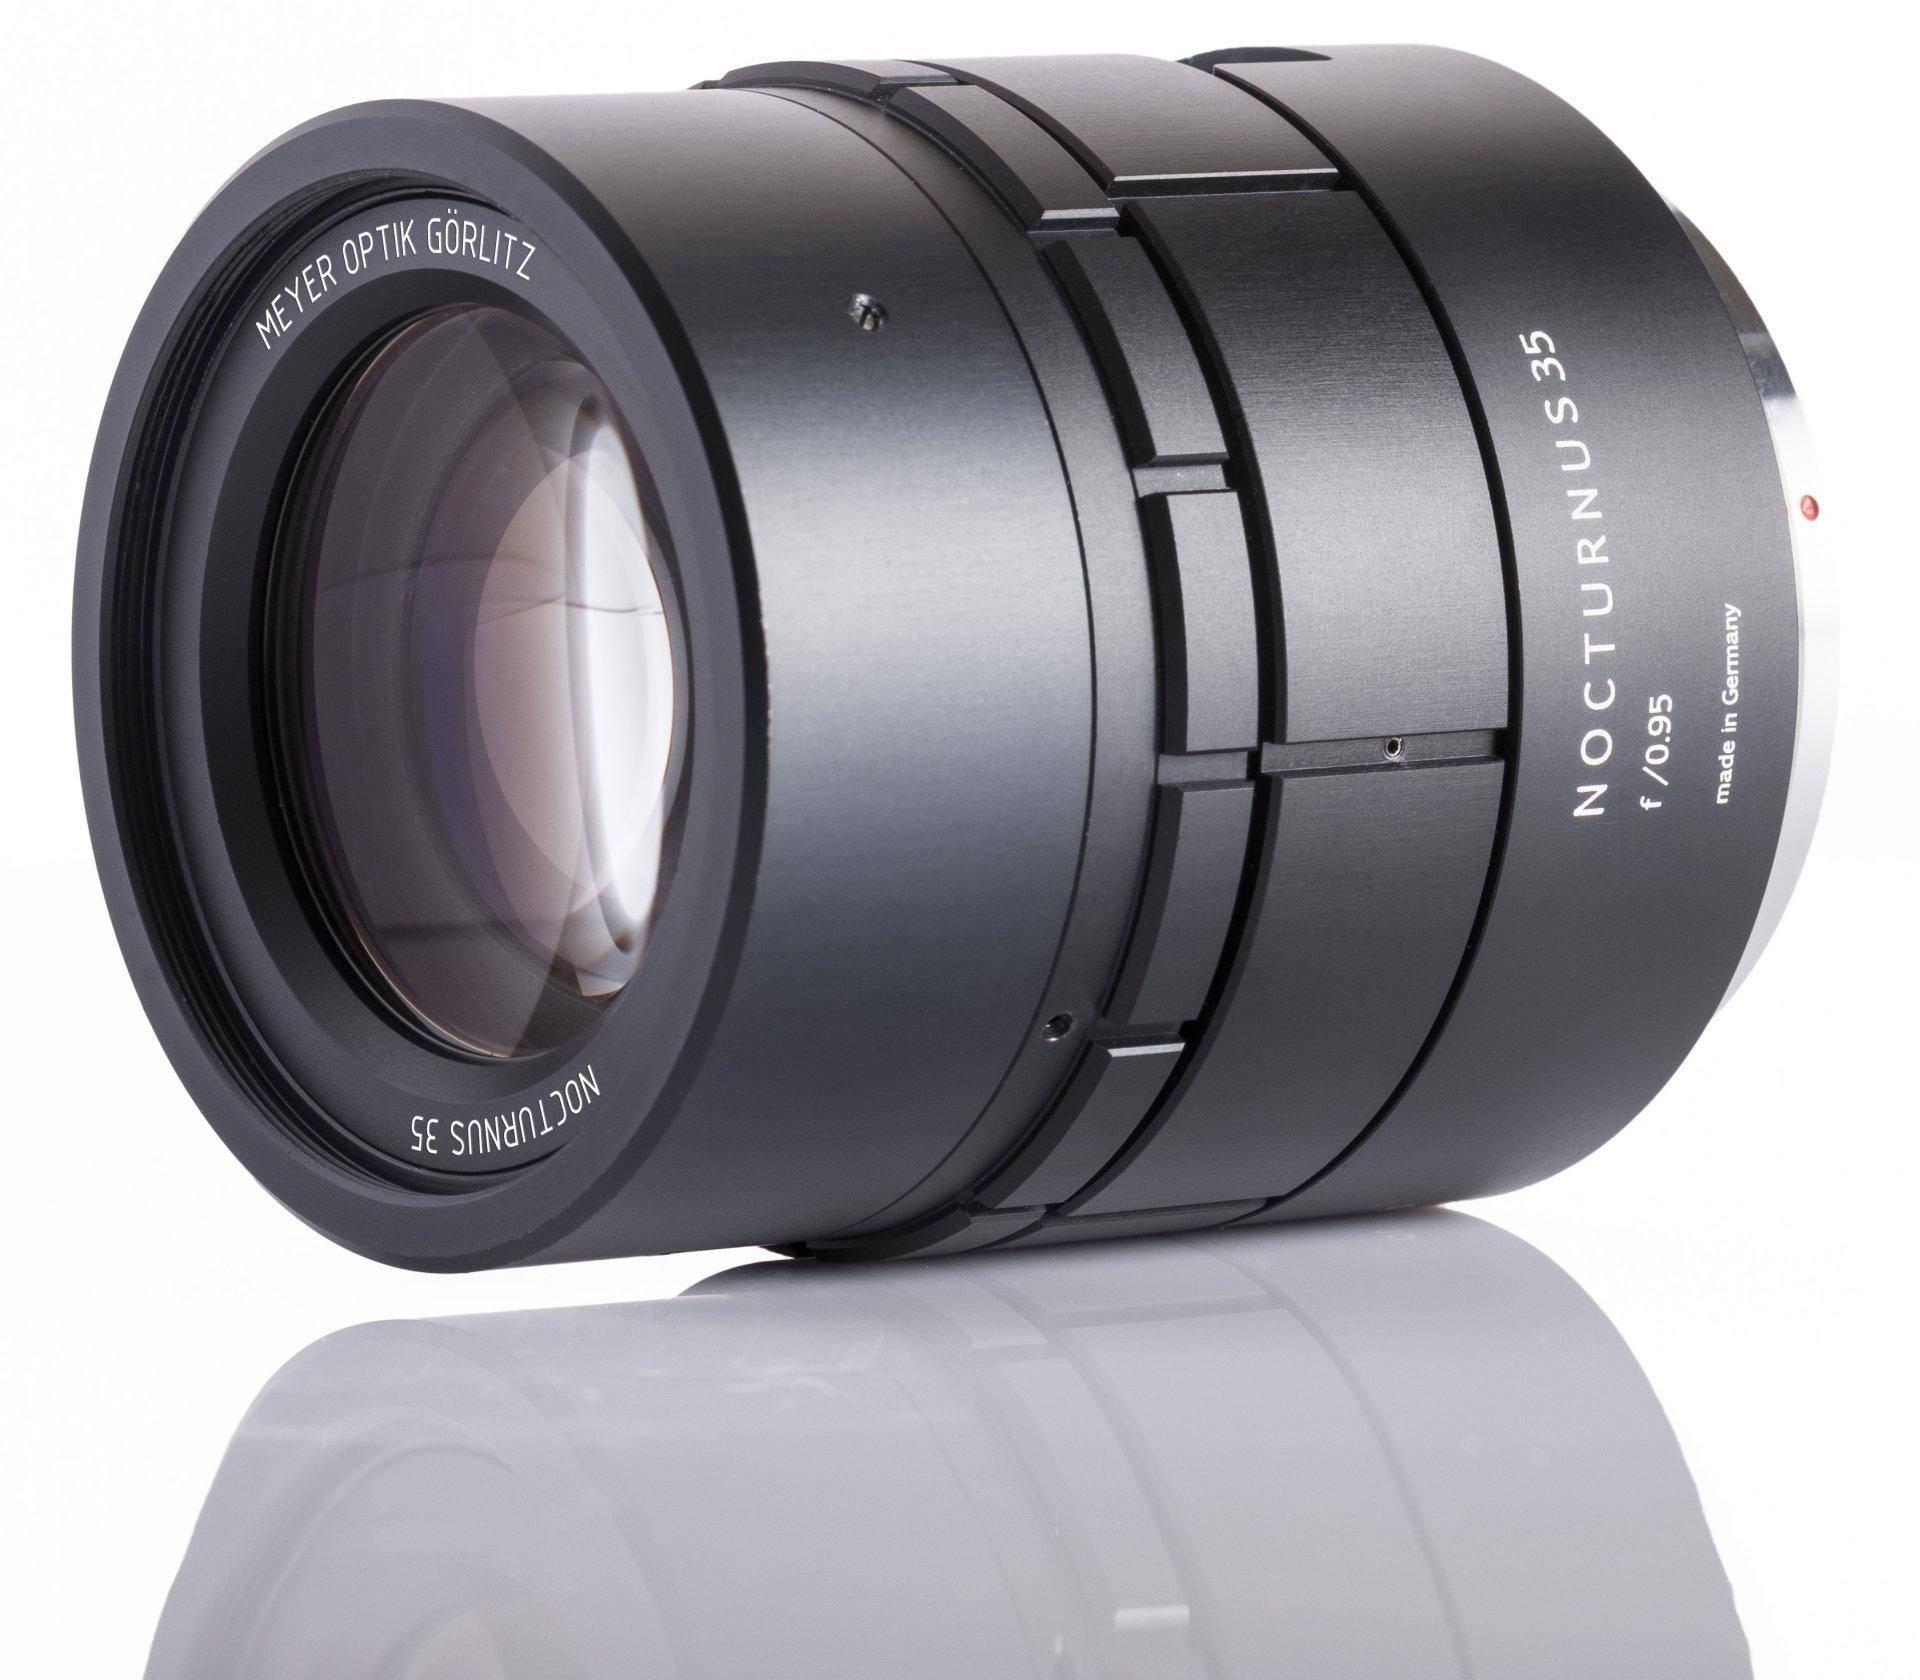 MEYER OPTIK GÖRLITZ 35 mm f/0,95 Nocturnus pro Olympus/Panasonic MFT